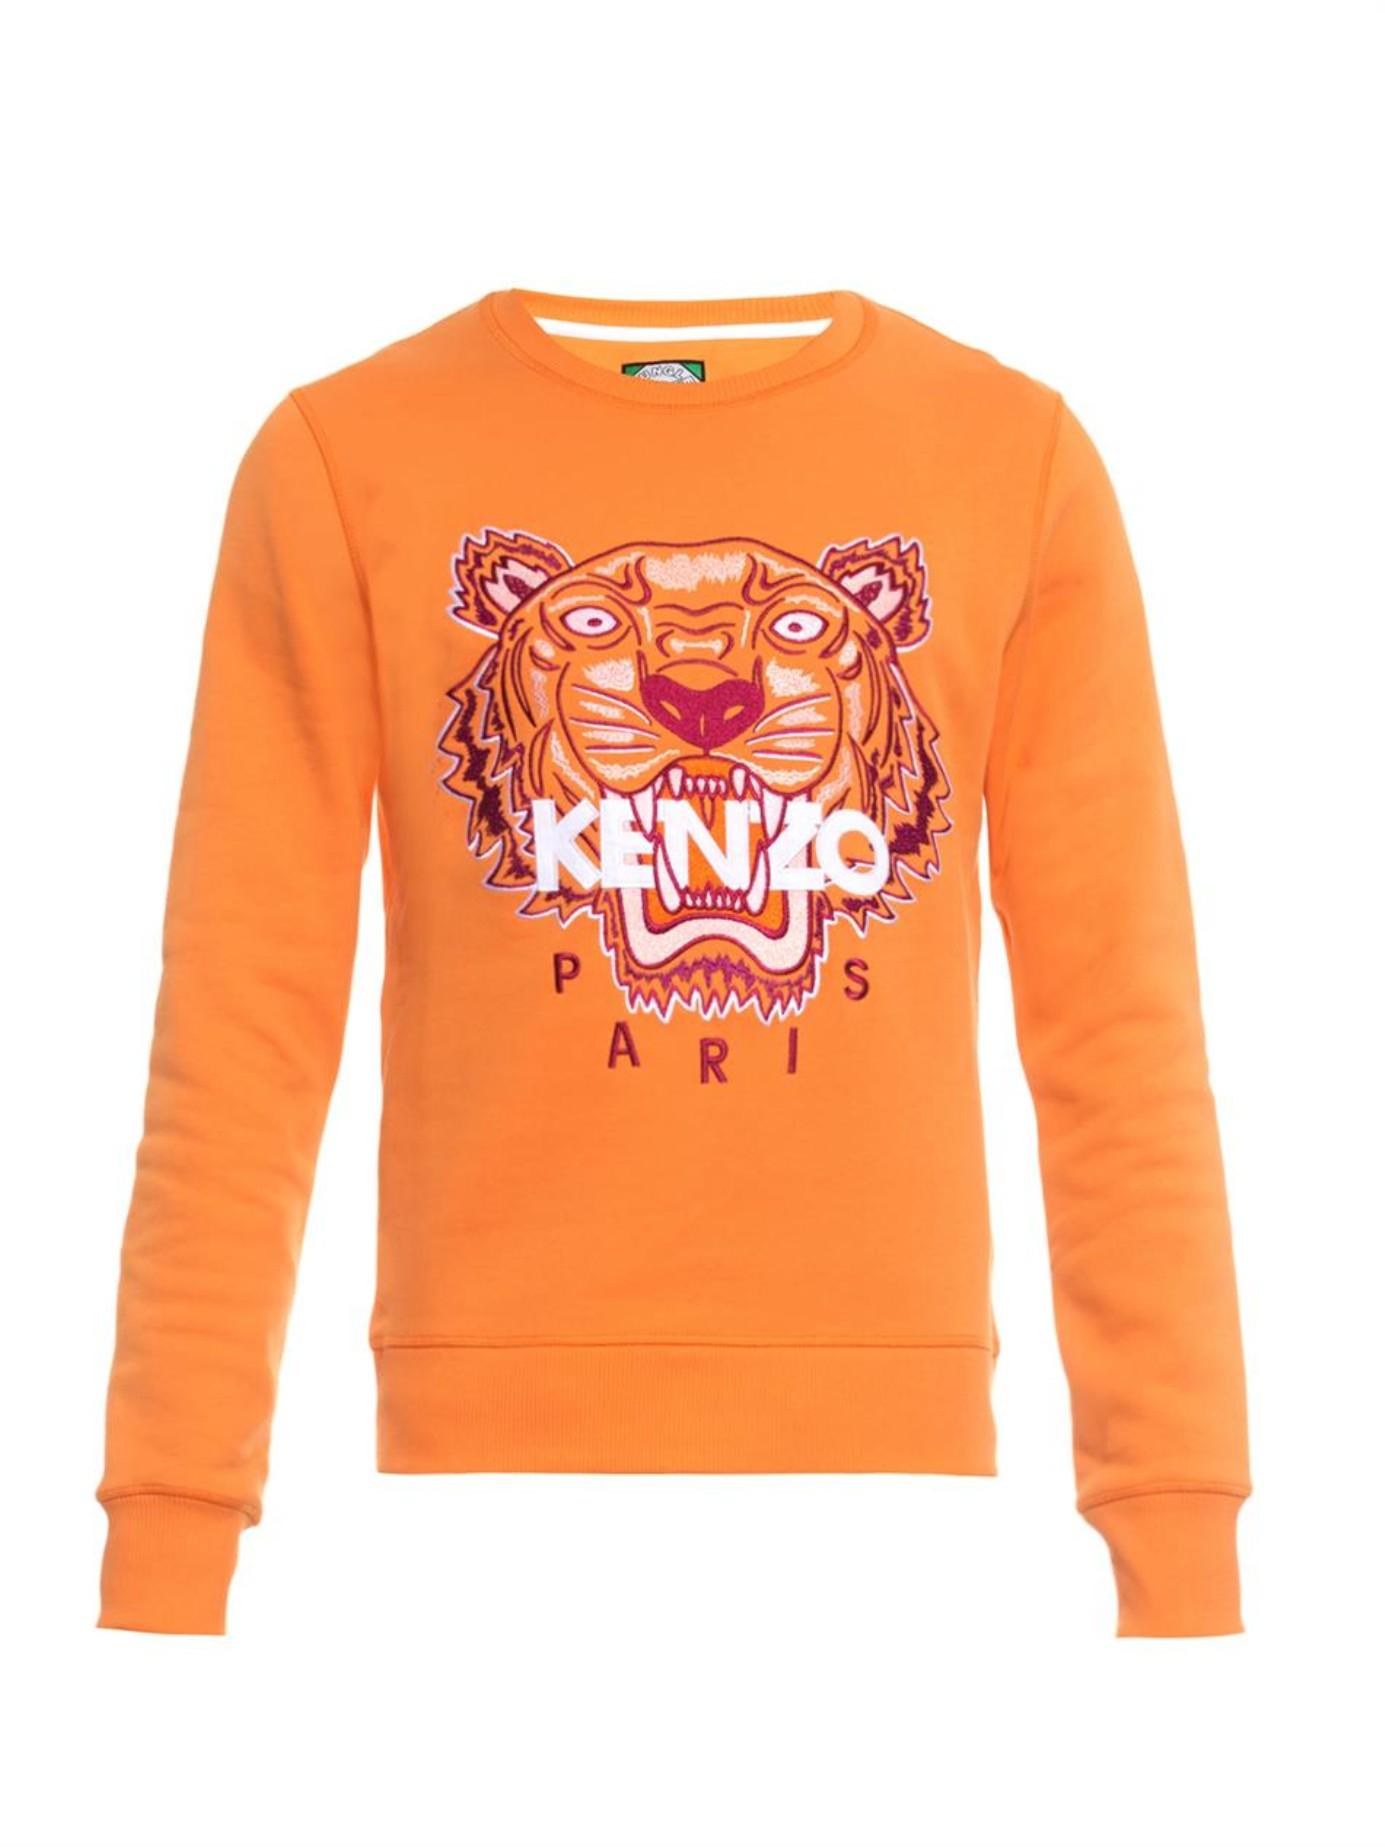 Orange Sweatshirt Men For Kenzo Tiger Embroidered hQrsdt